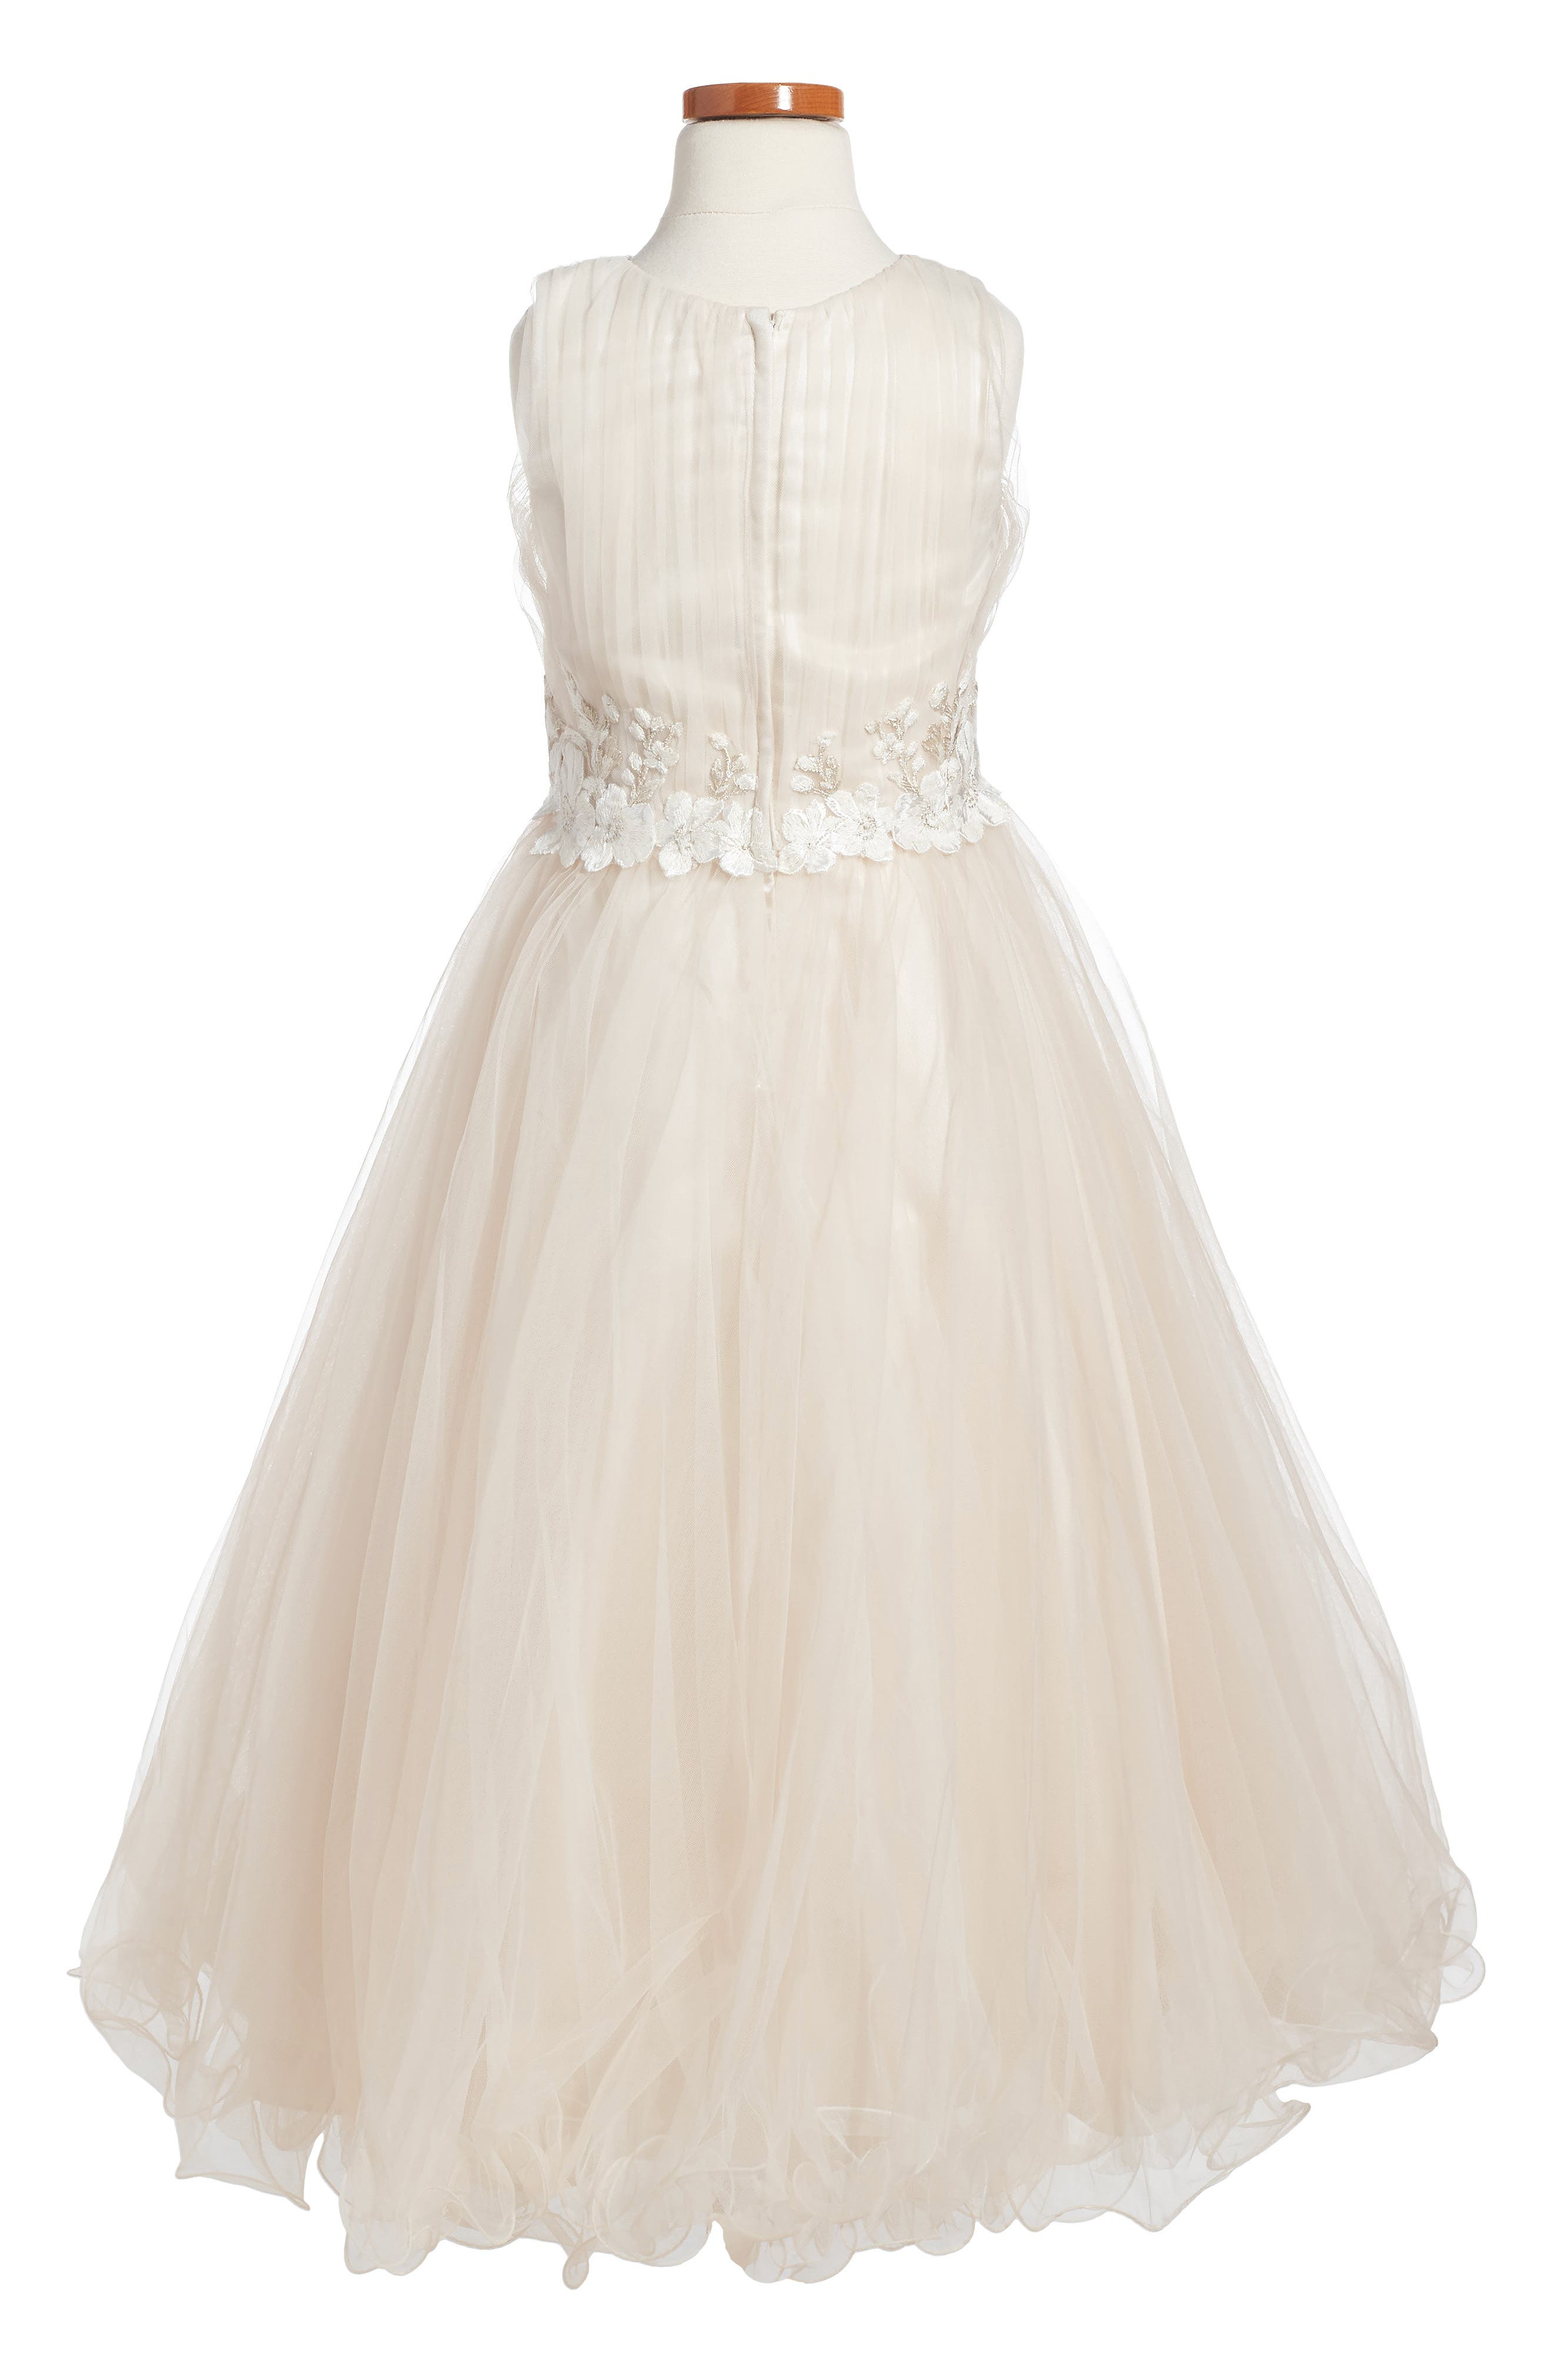 Lace & Tulle Dress,                             Alternate thumbnail 2, color,